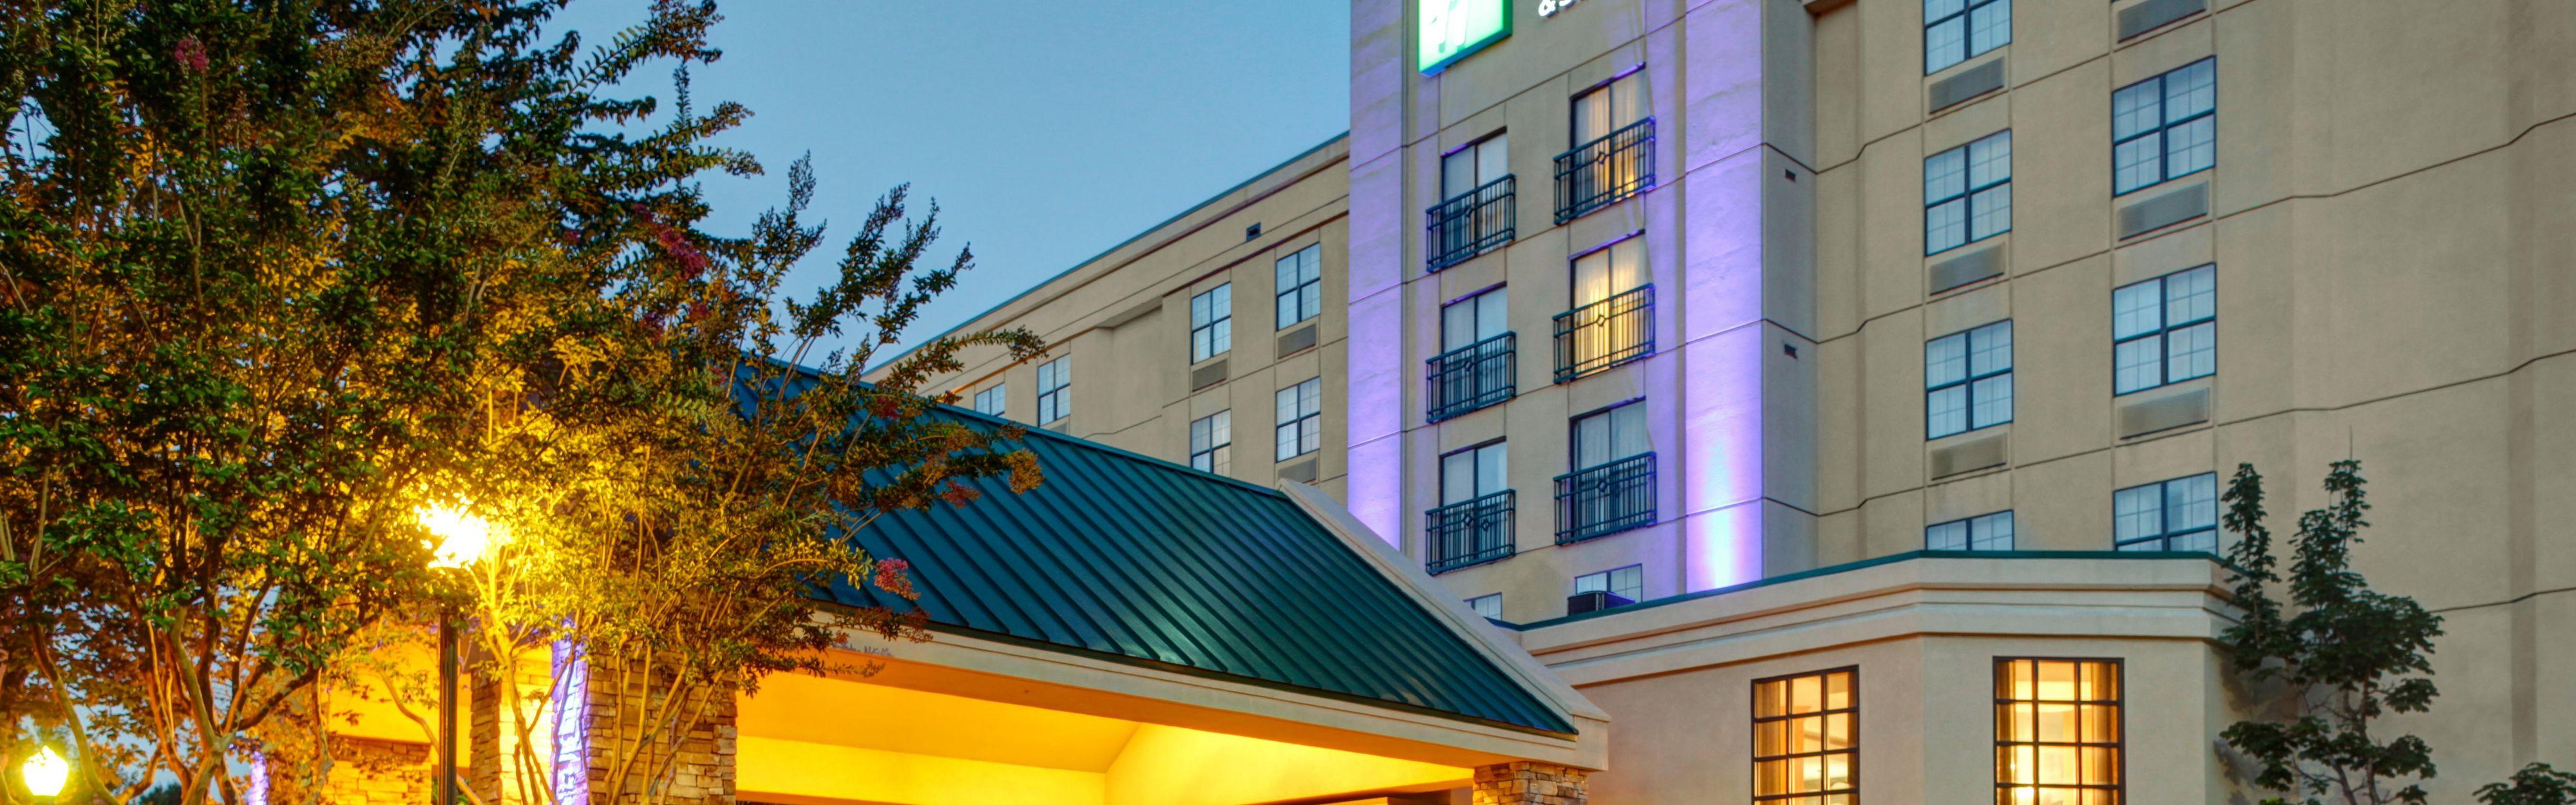 Holiday Inn Express & Suites Atlanta Buckhead image 0